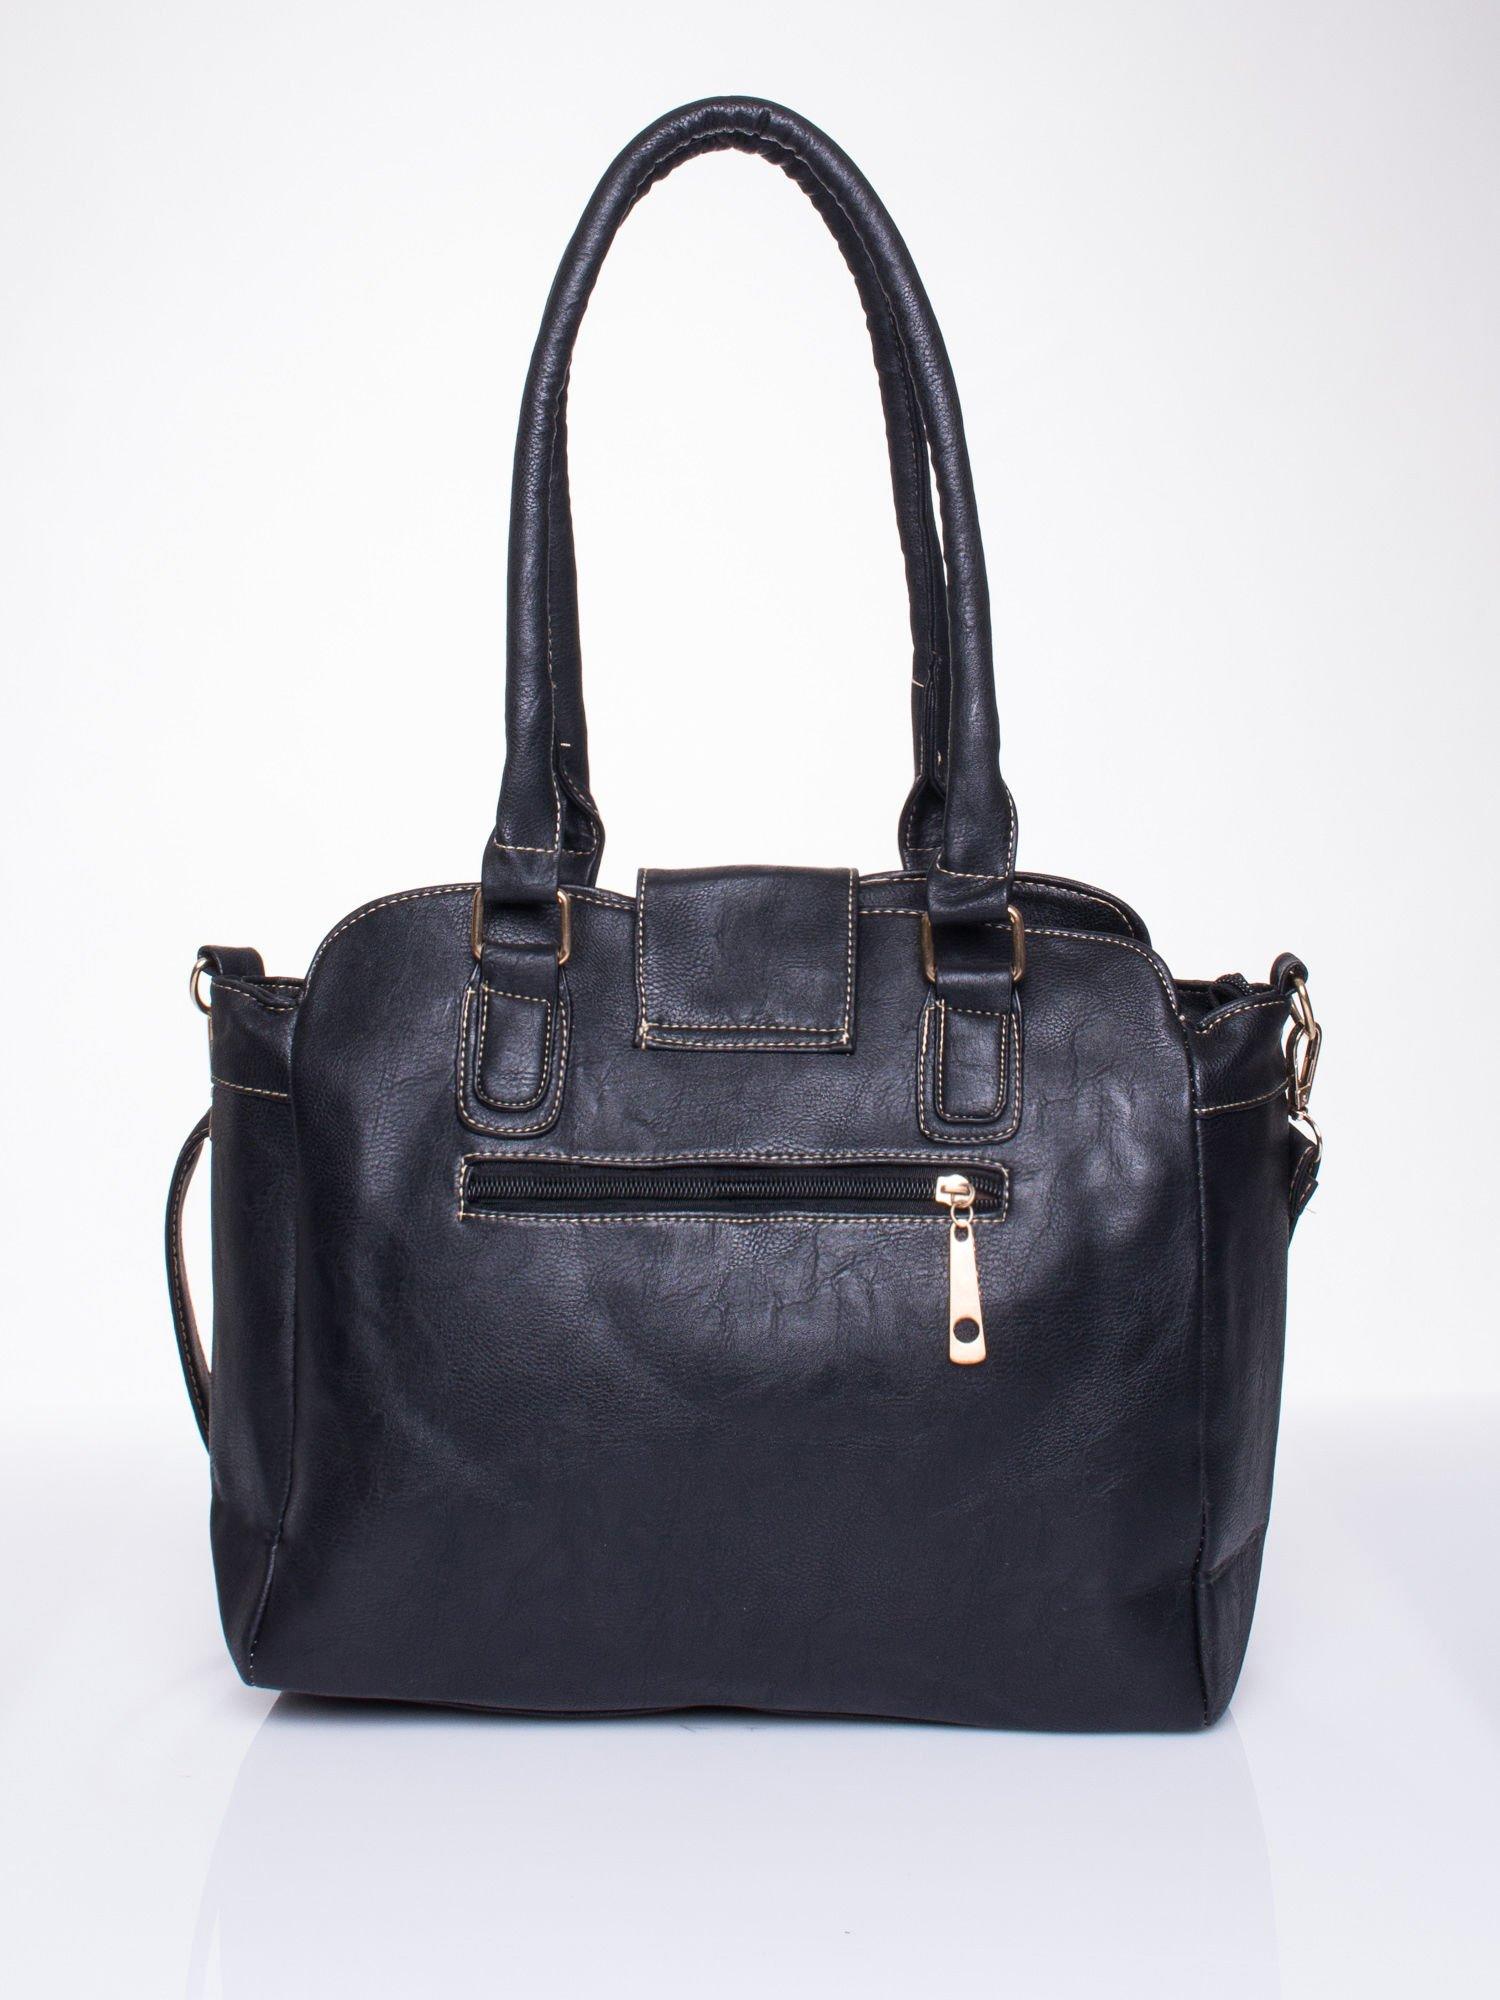 Czarna torba miejska z klapką                                  zdj.                                  2